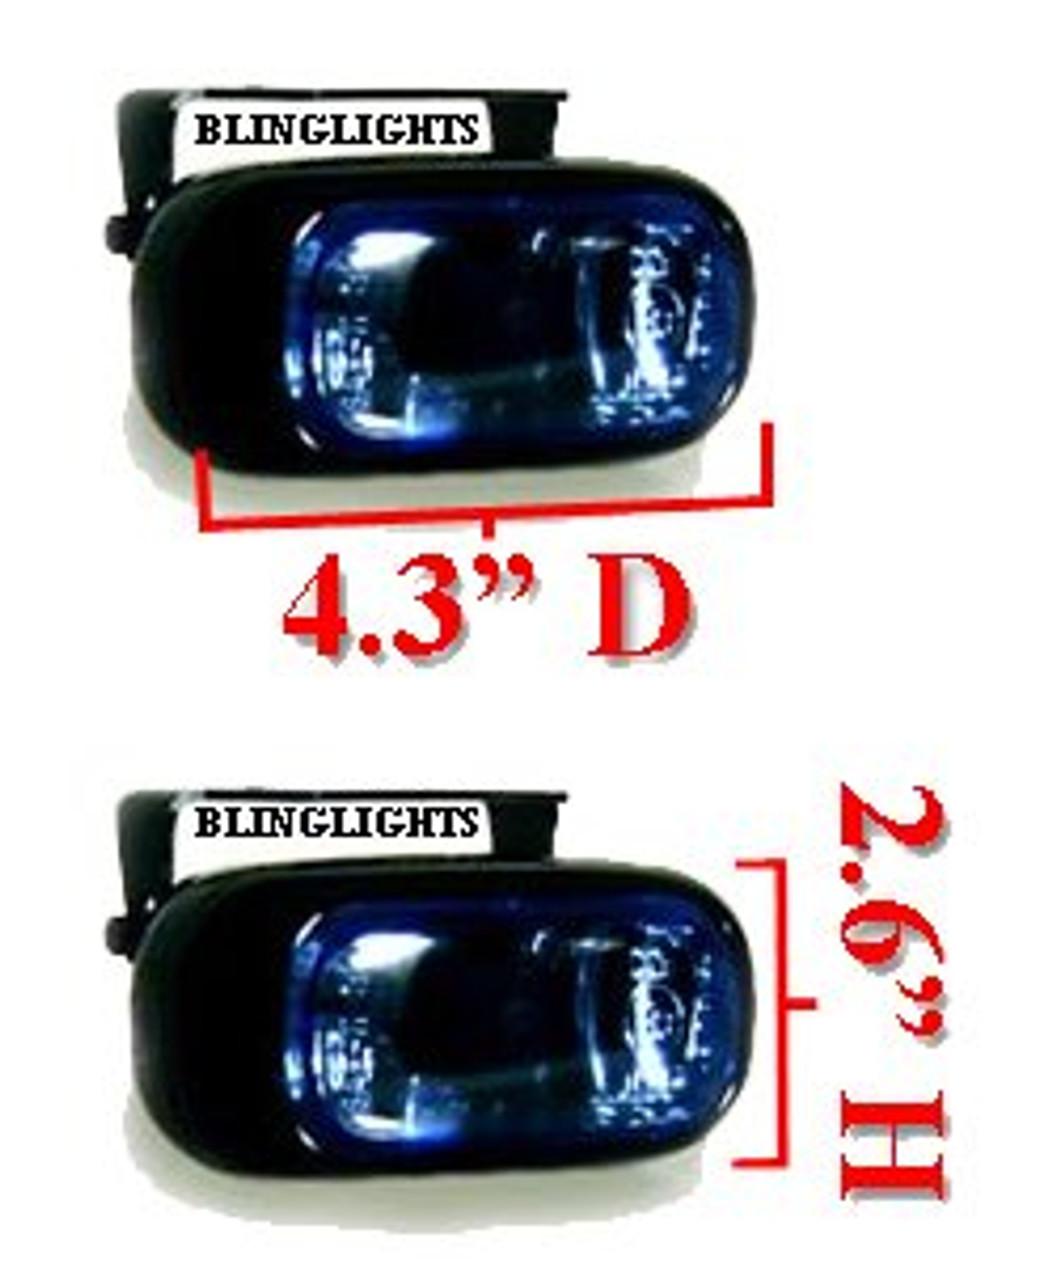 1992 1993 1994 Mitsubishi Eclipse Xenon Fog Lights Driving Lamps Foglamps Foglights Kit